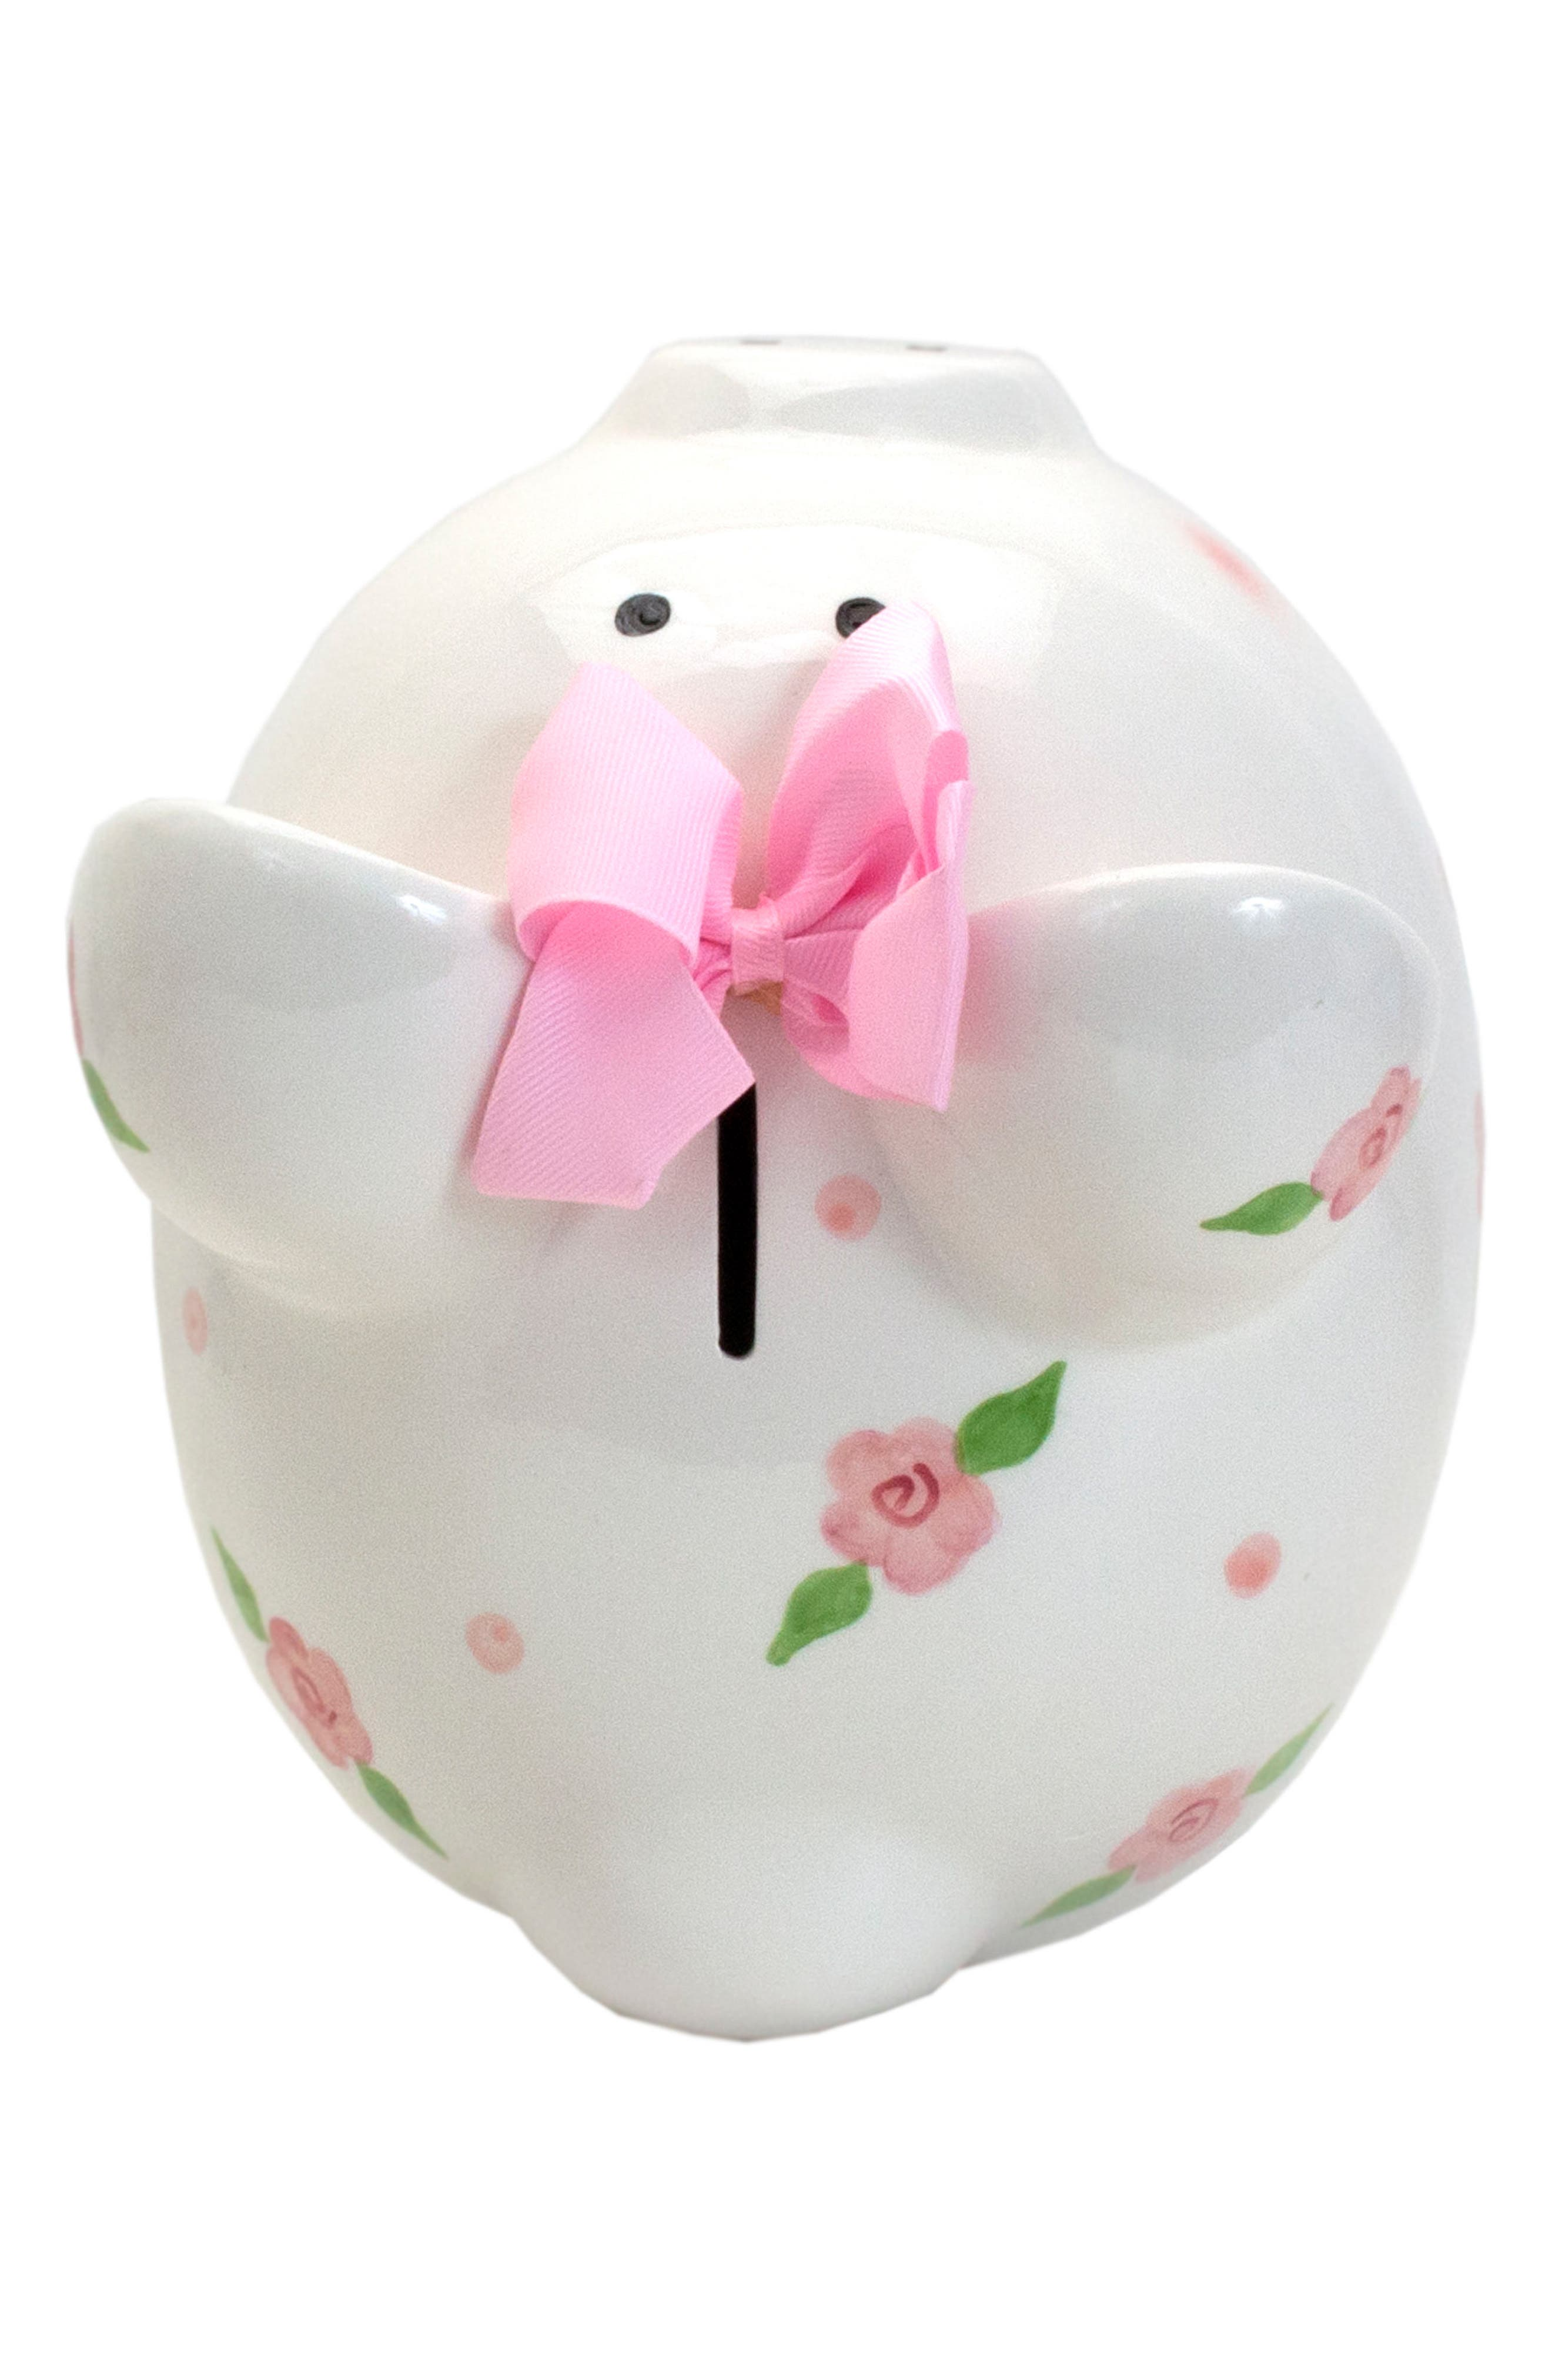 Embellished Piggy Bank,                             Alternate thumbnail 4, color,                             WHITE